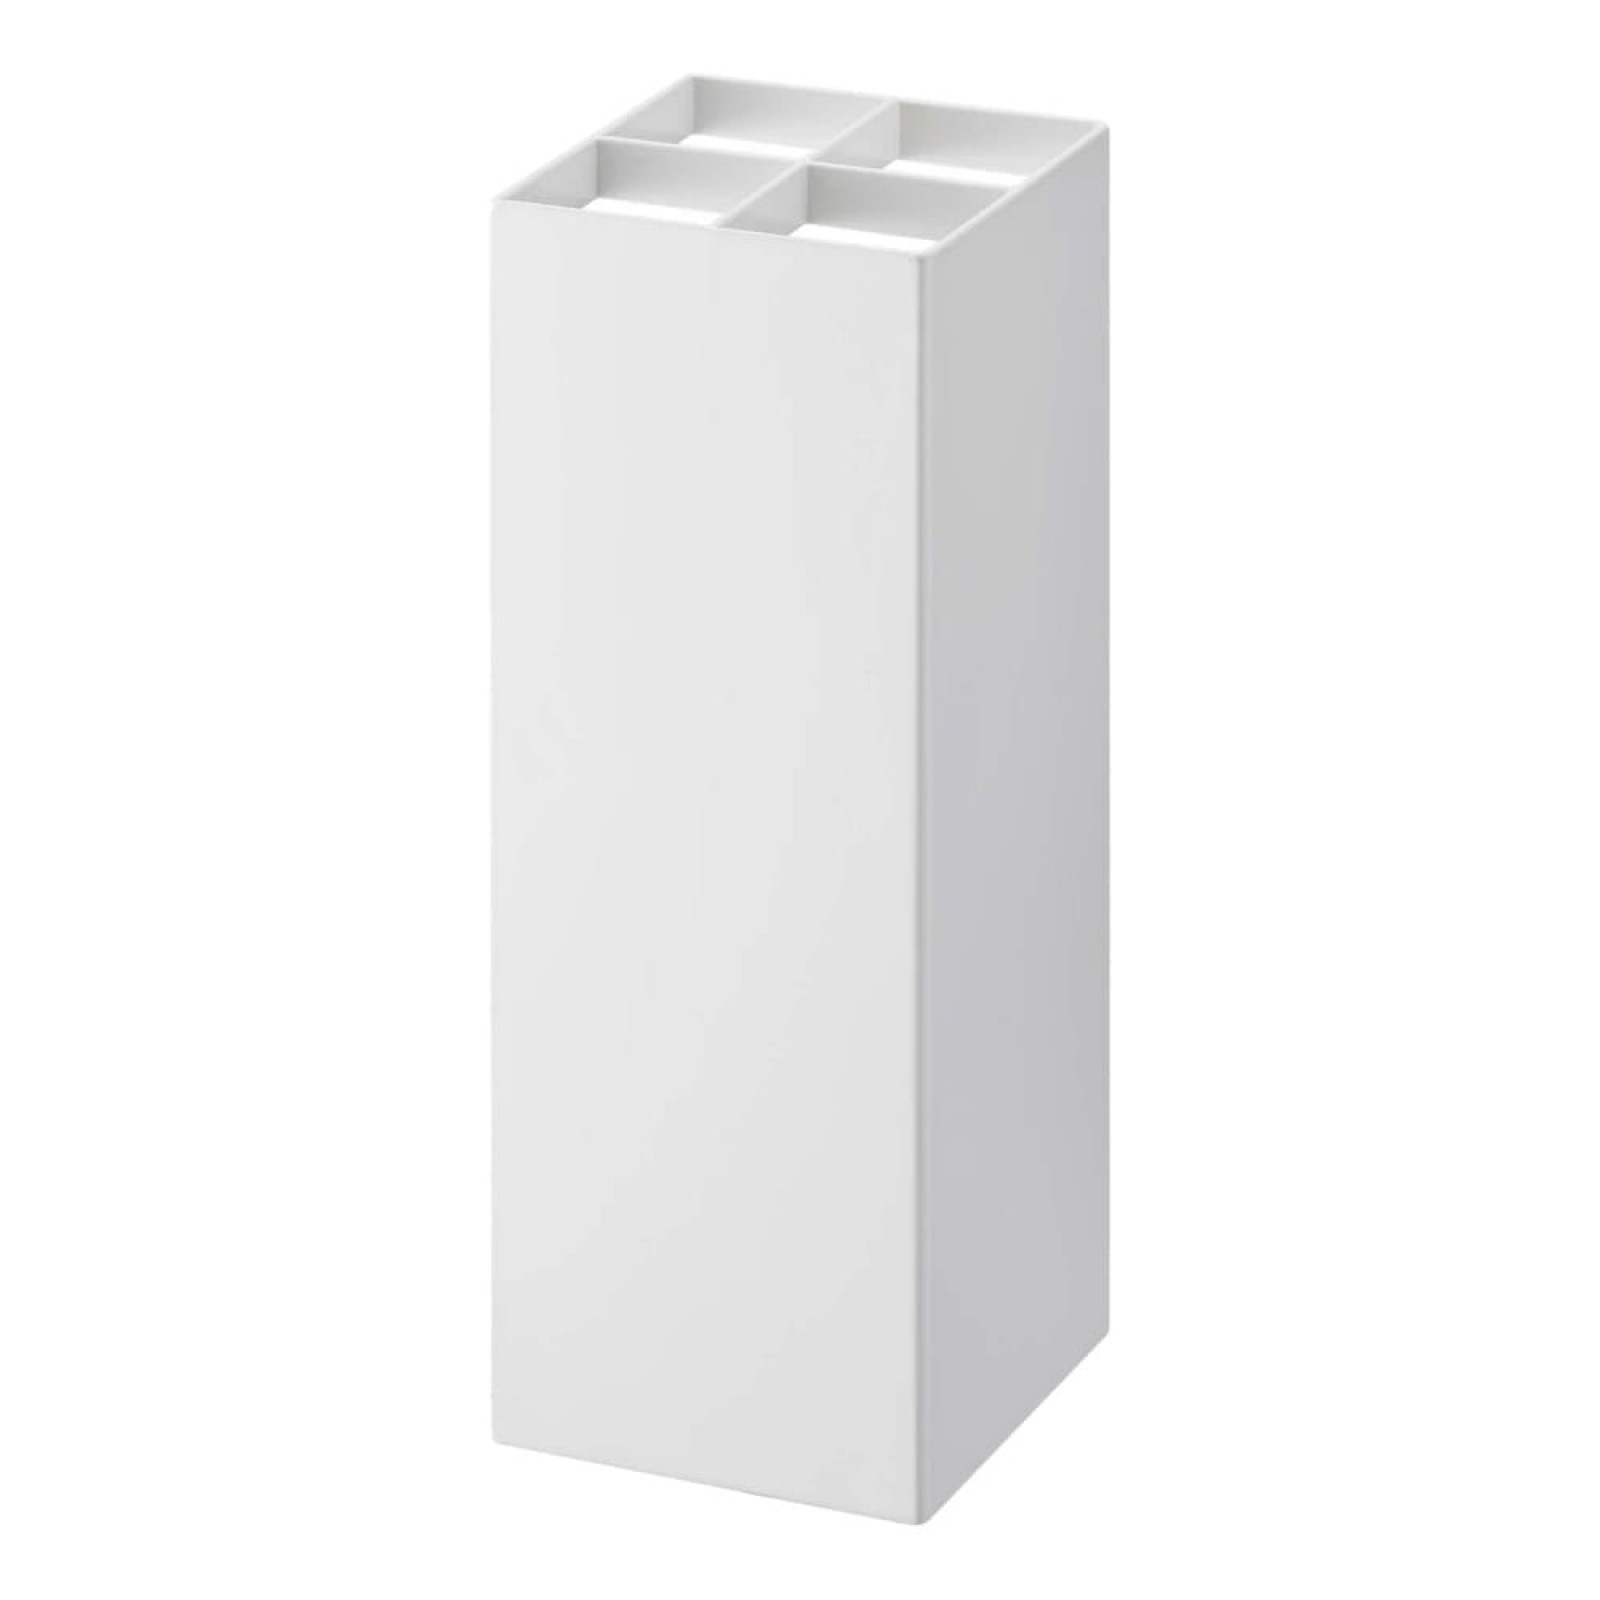 Smart Adjustable Umbrella Stand (White) - Yamazaki